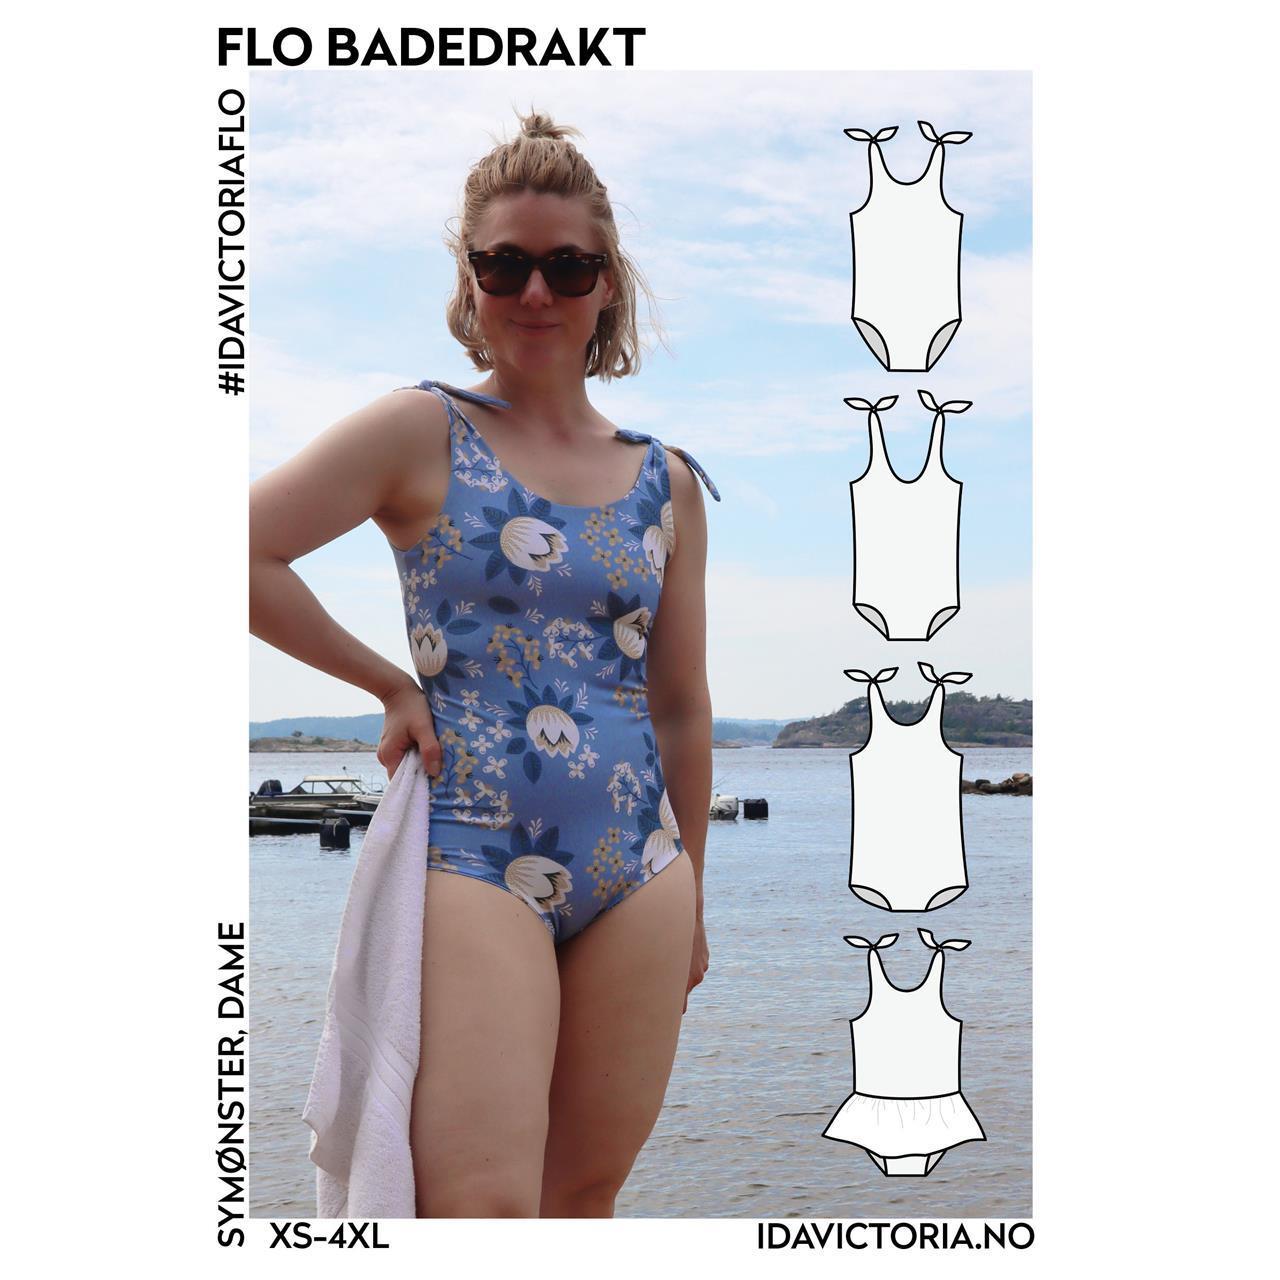 Flo Badedrakt